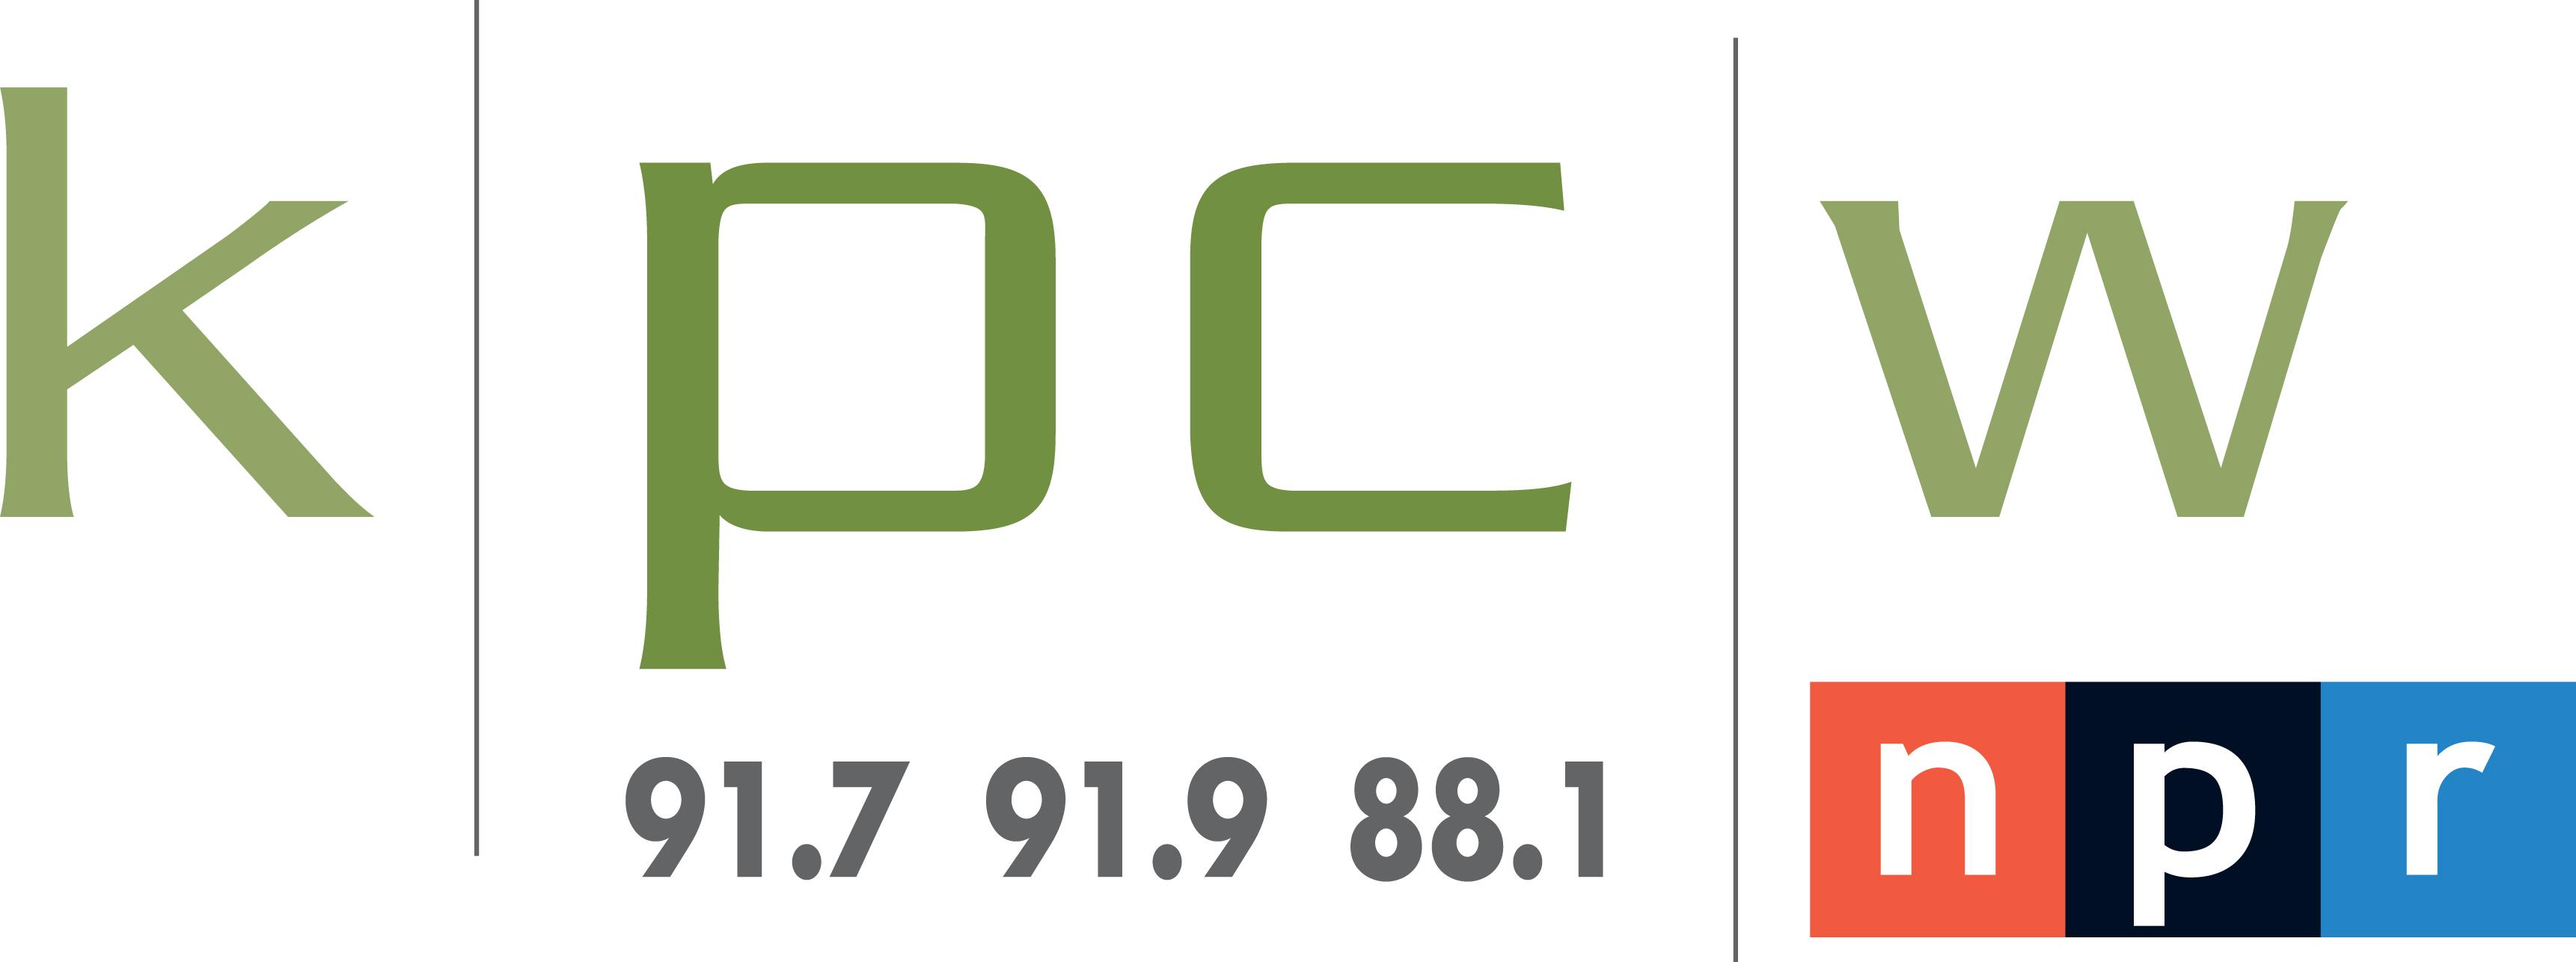 KPCW logo